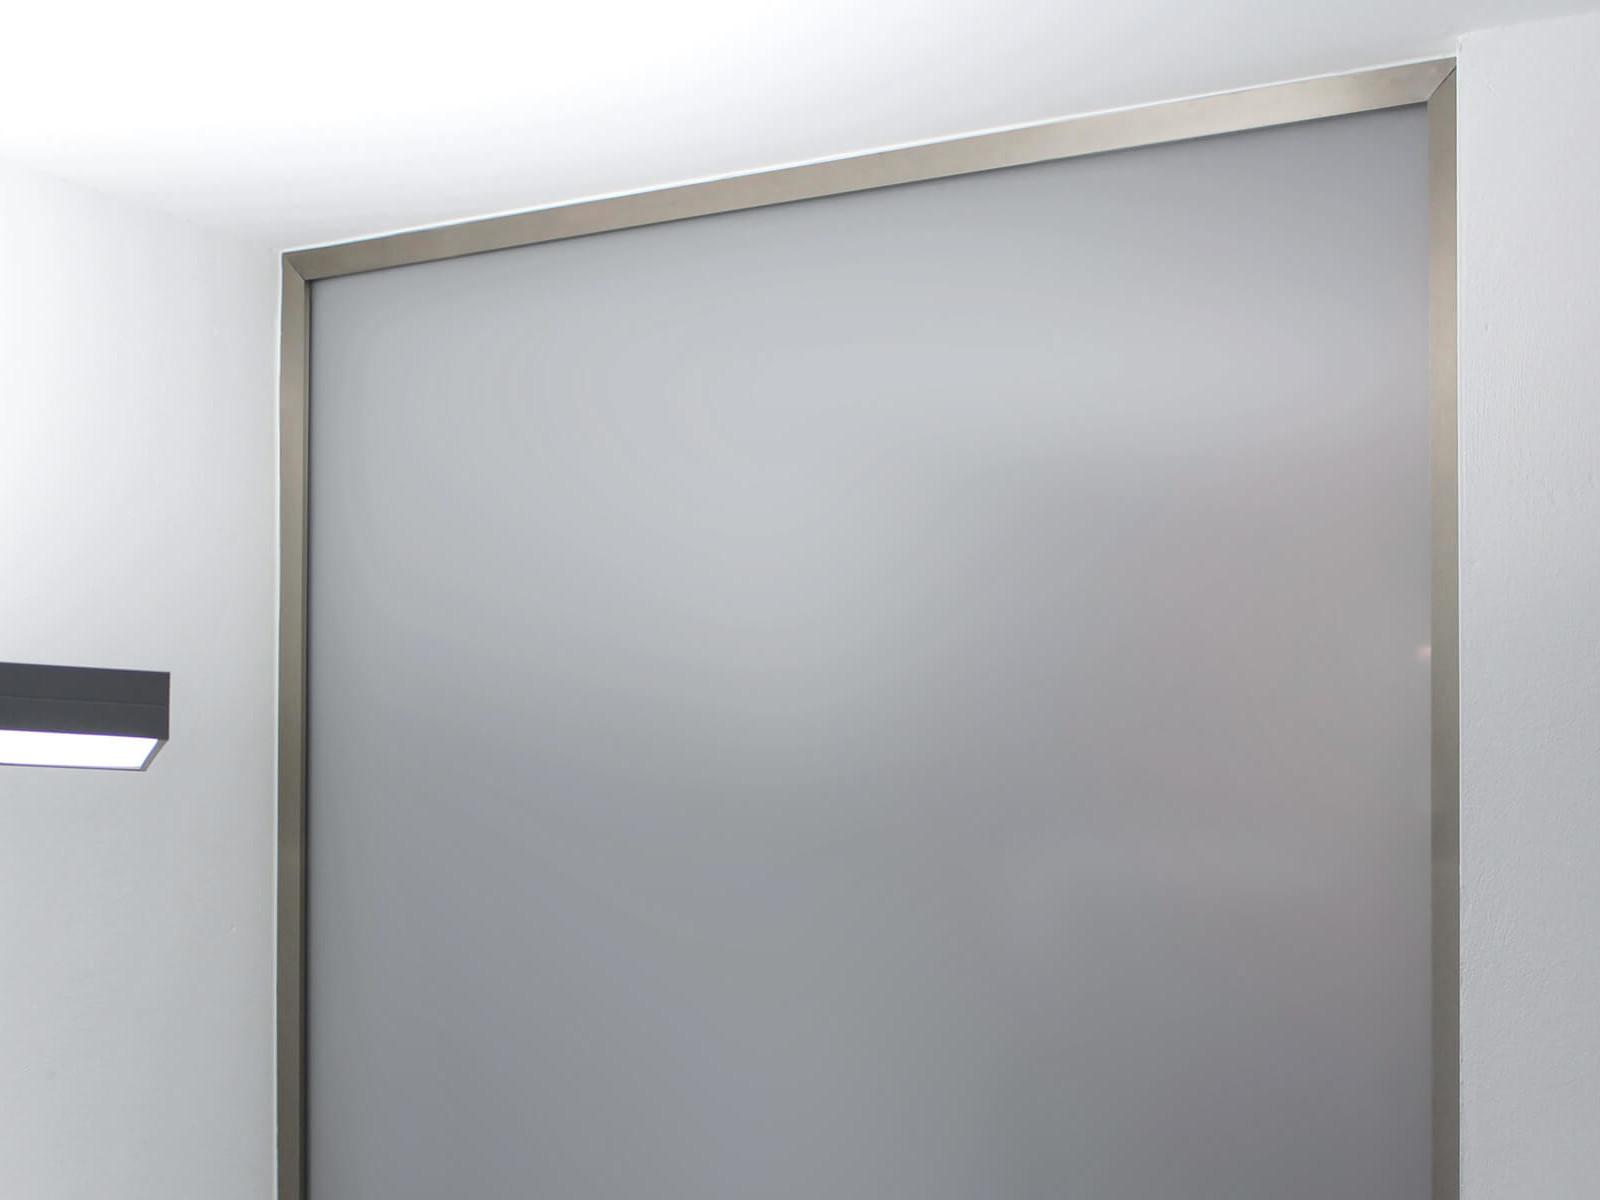 testglas-akustikwand-im-büro